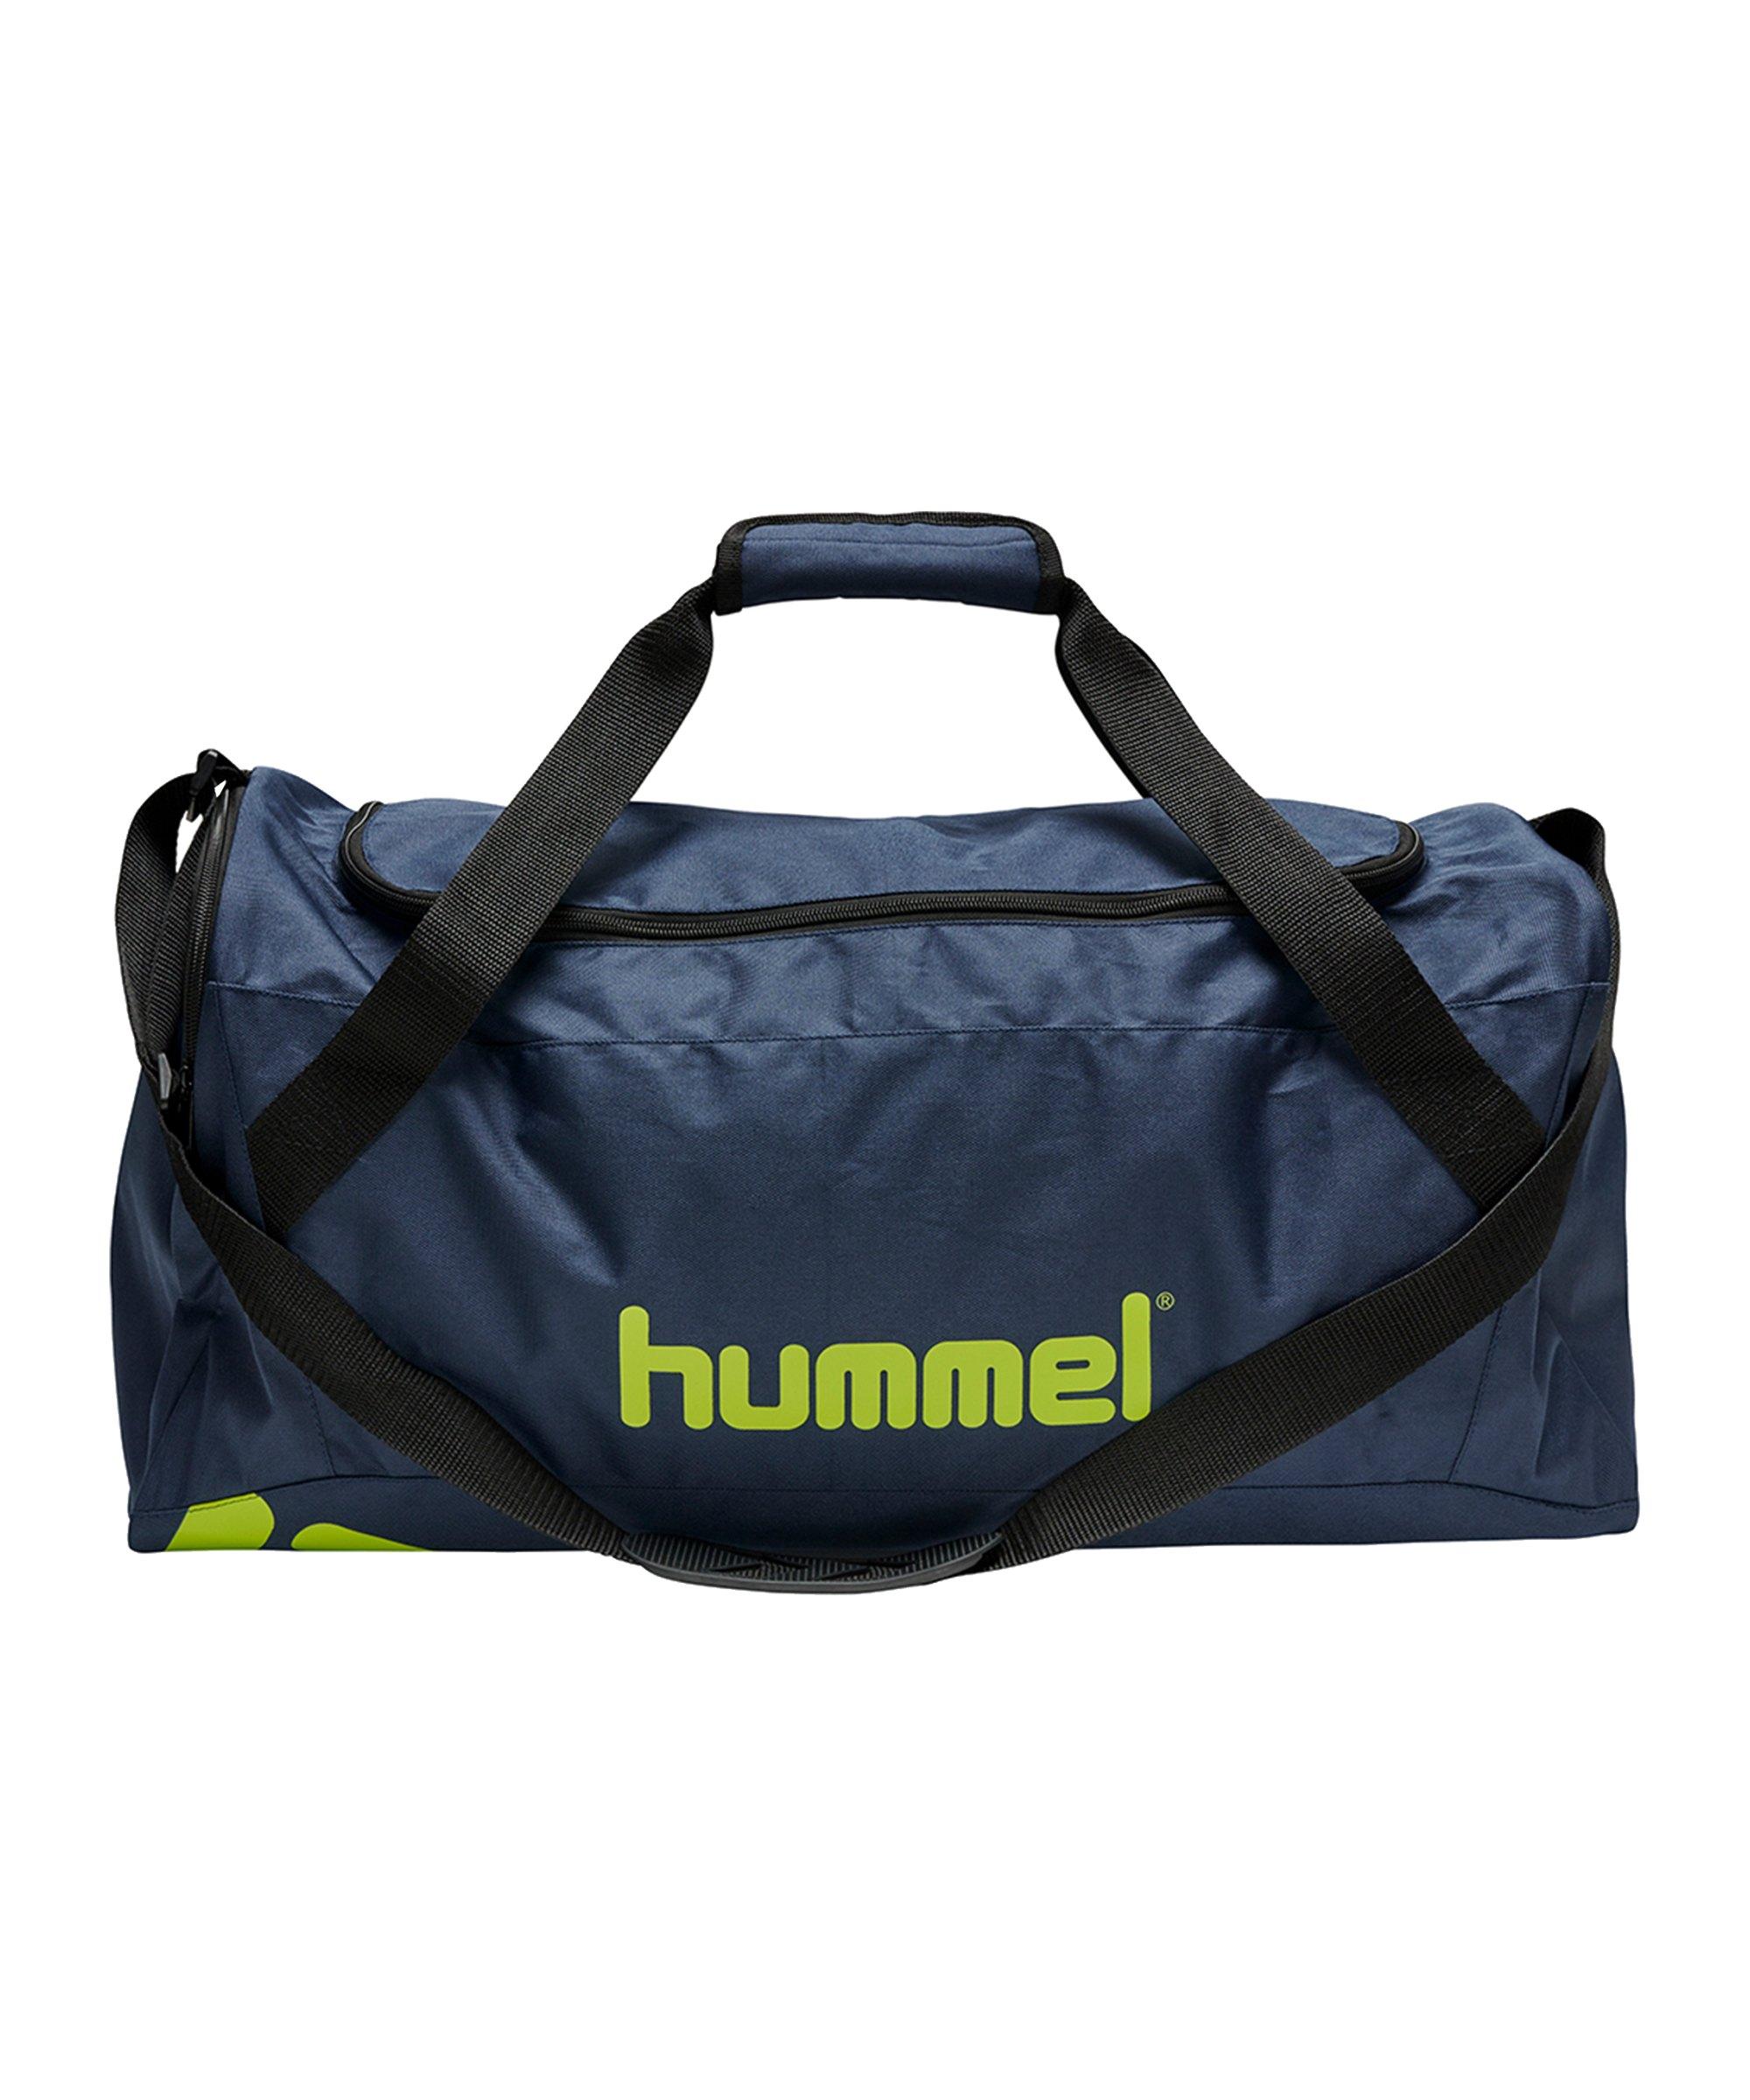 Hummel Core Bag Sporttasche Blau F6616 Gr. L - blau